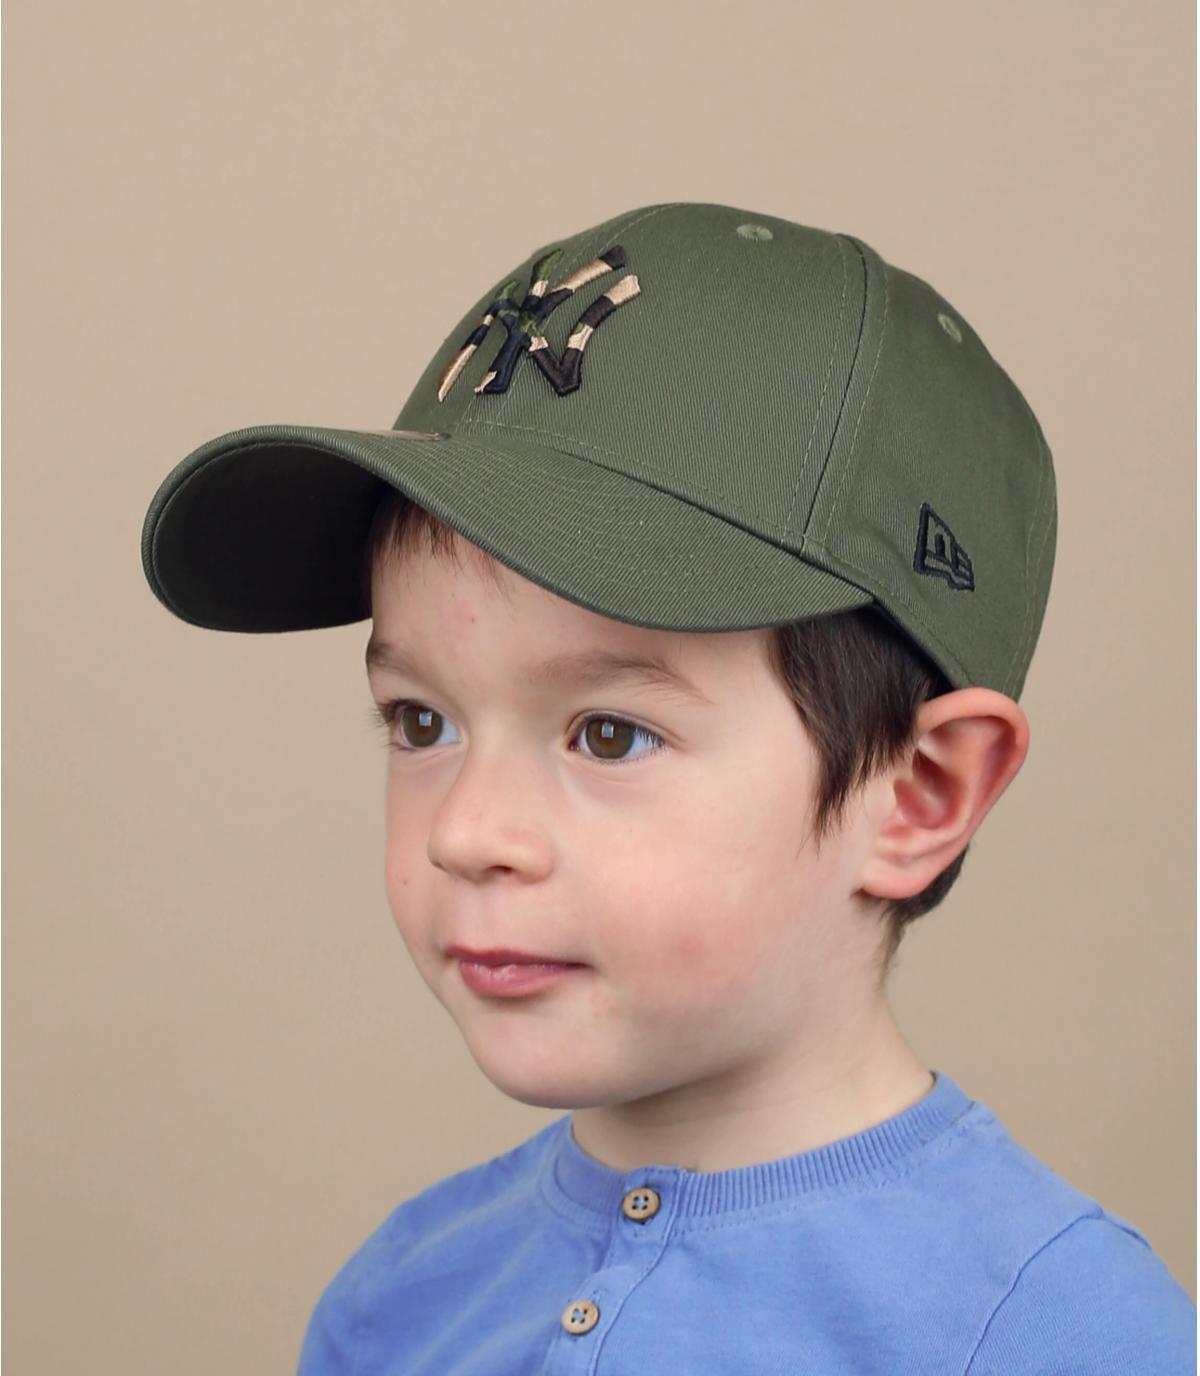 casquette enfant NY vert camo